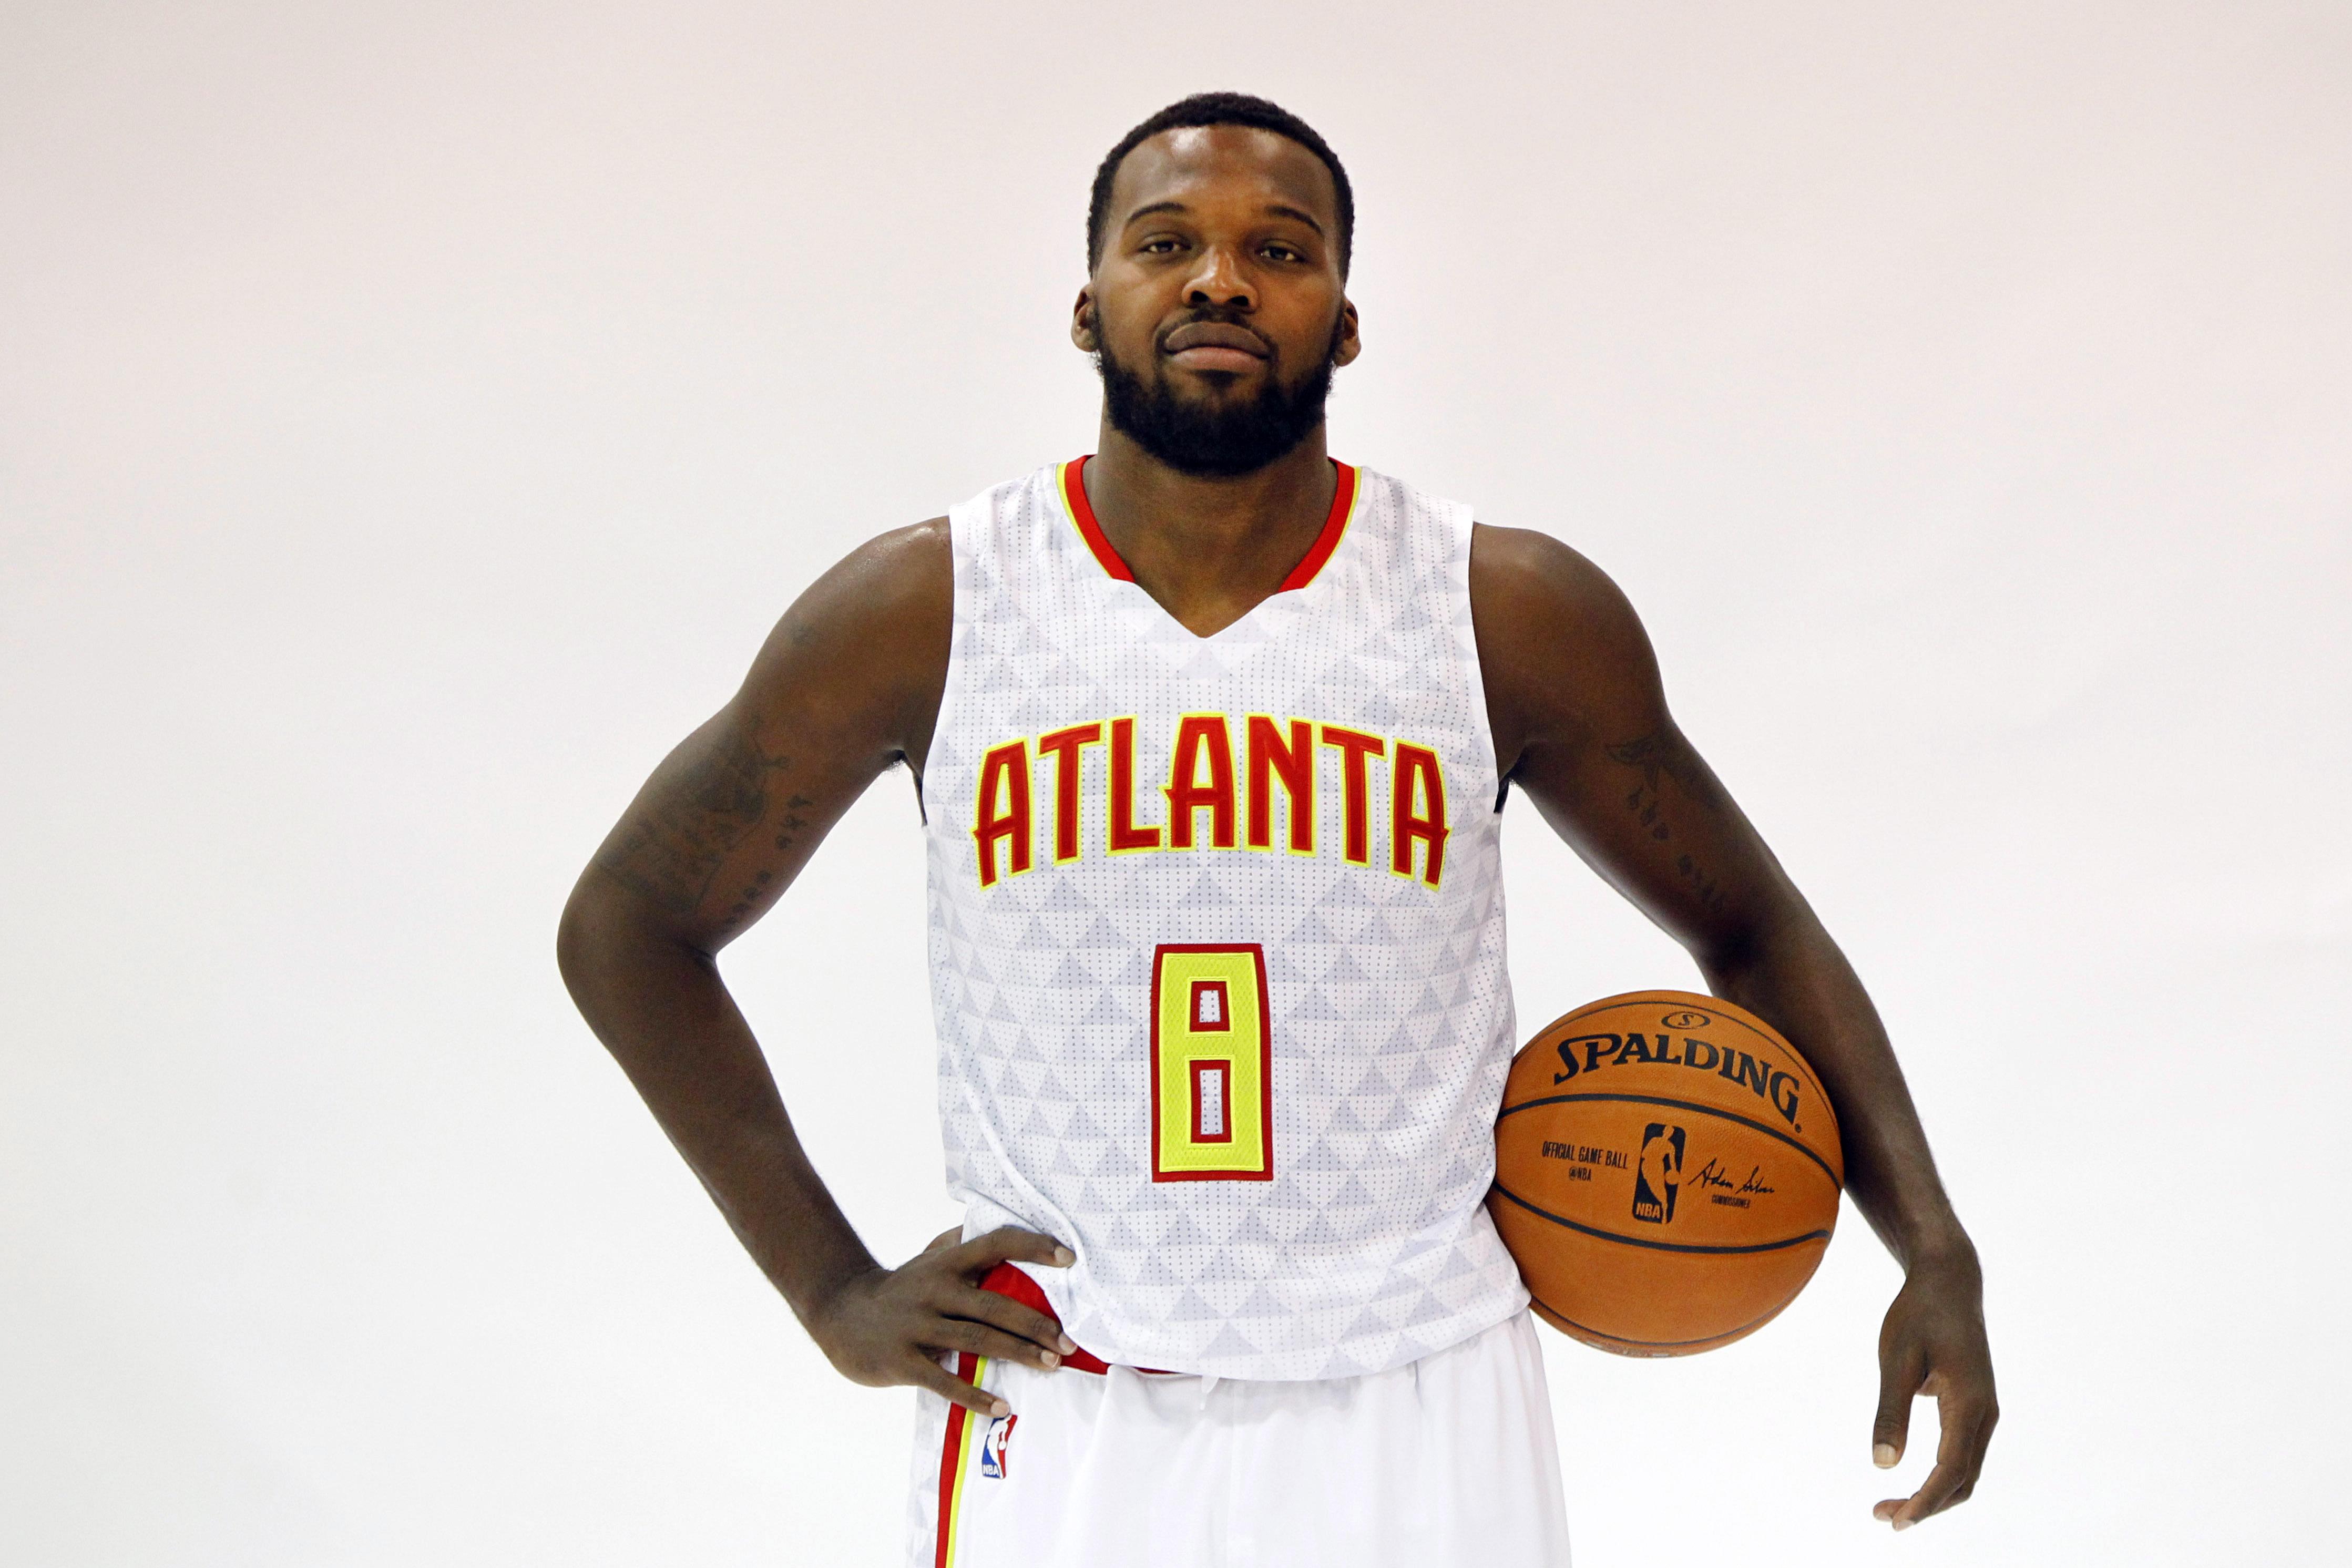 Possible Atlanta Hawks free agents: Shelvin Mack